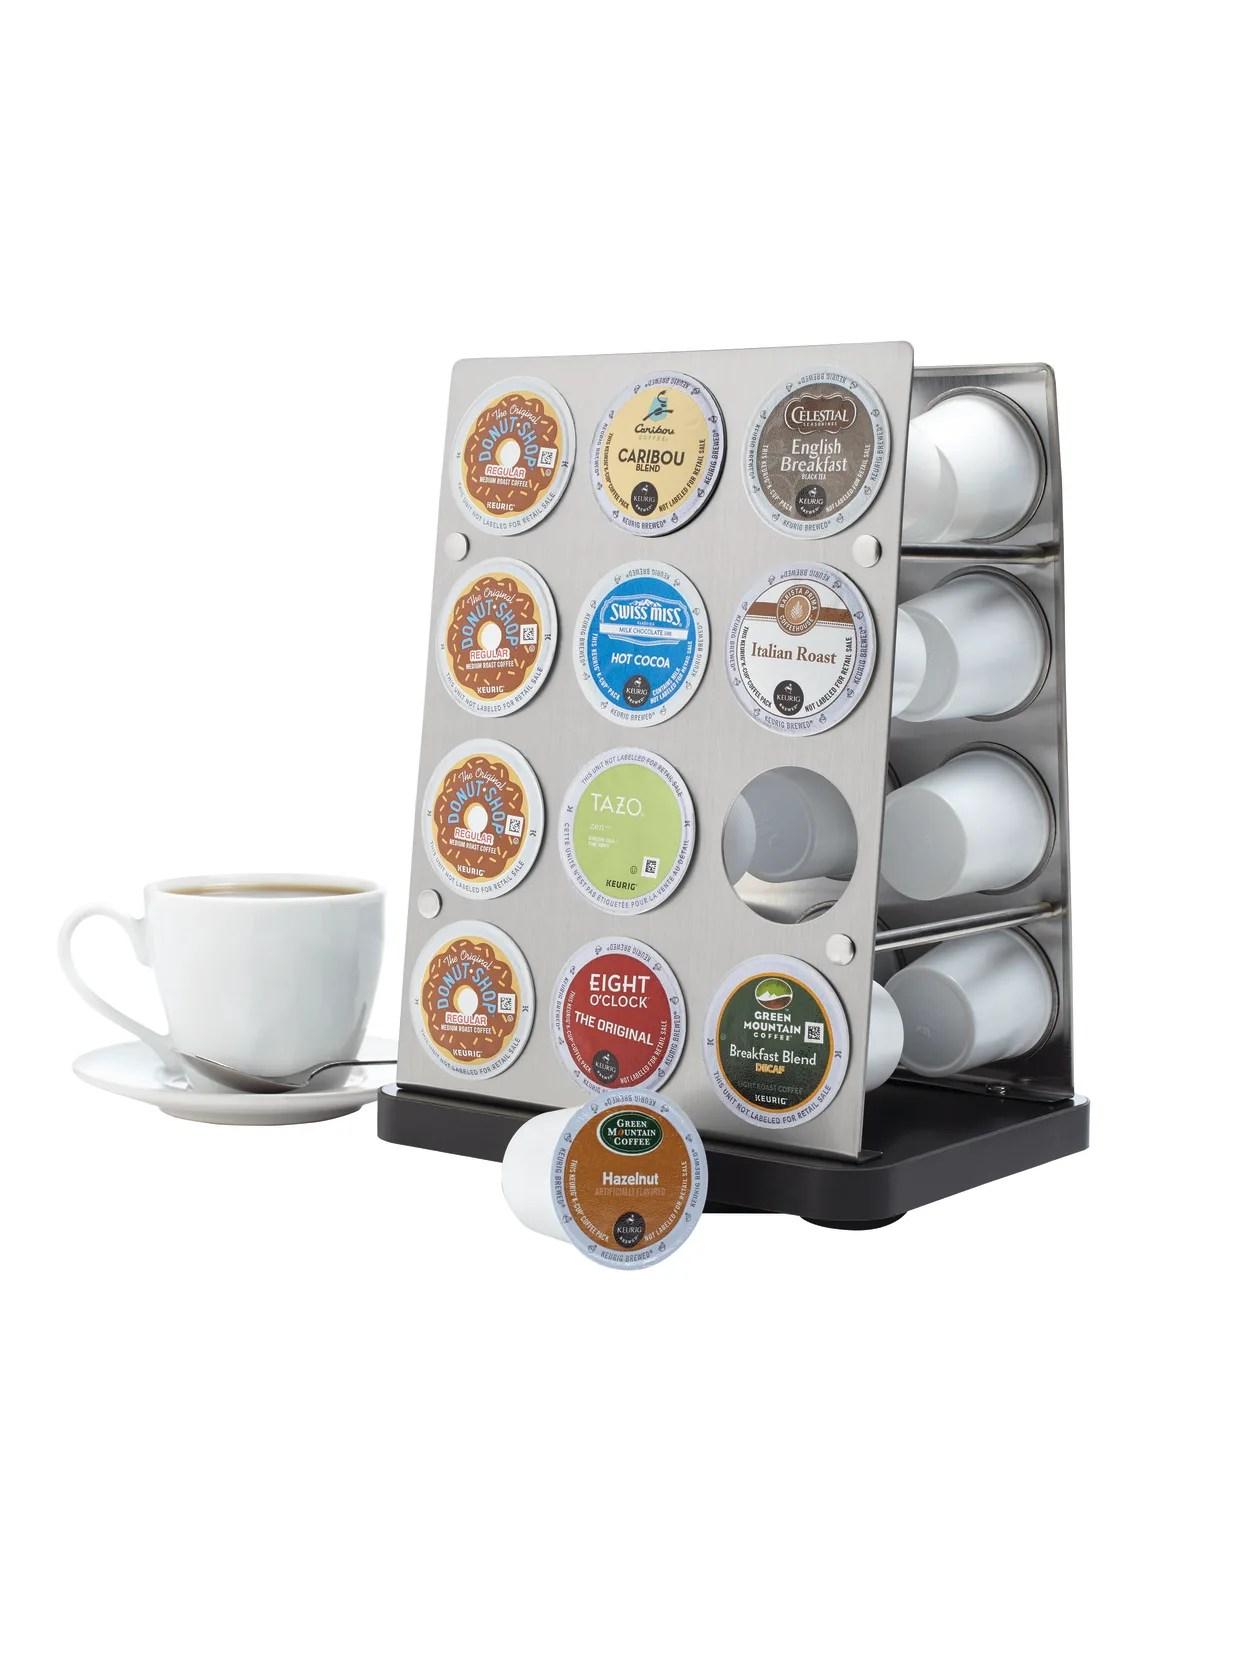 gnbi stainless steel coffee pod rack silver item 784382